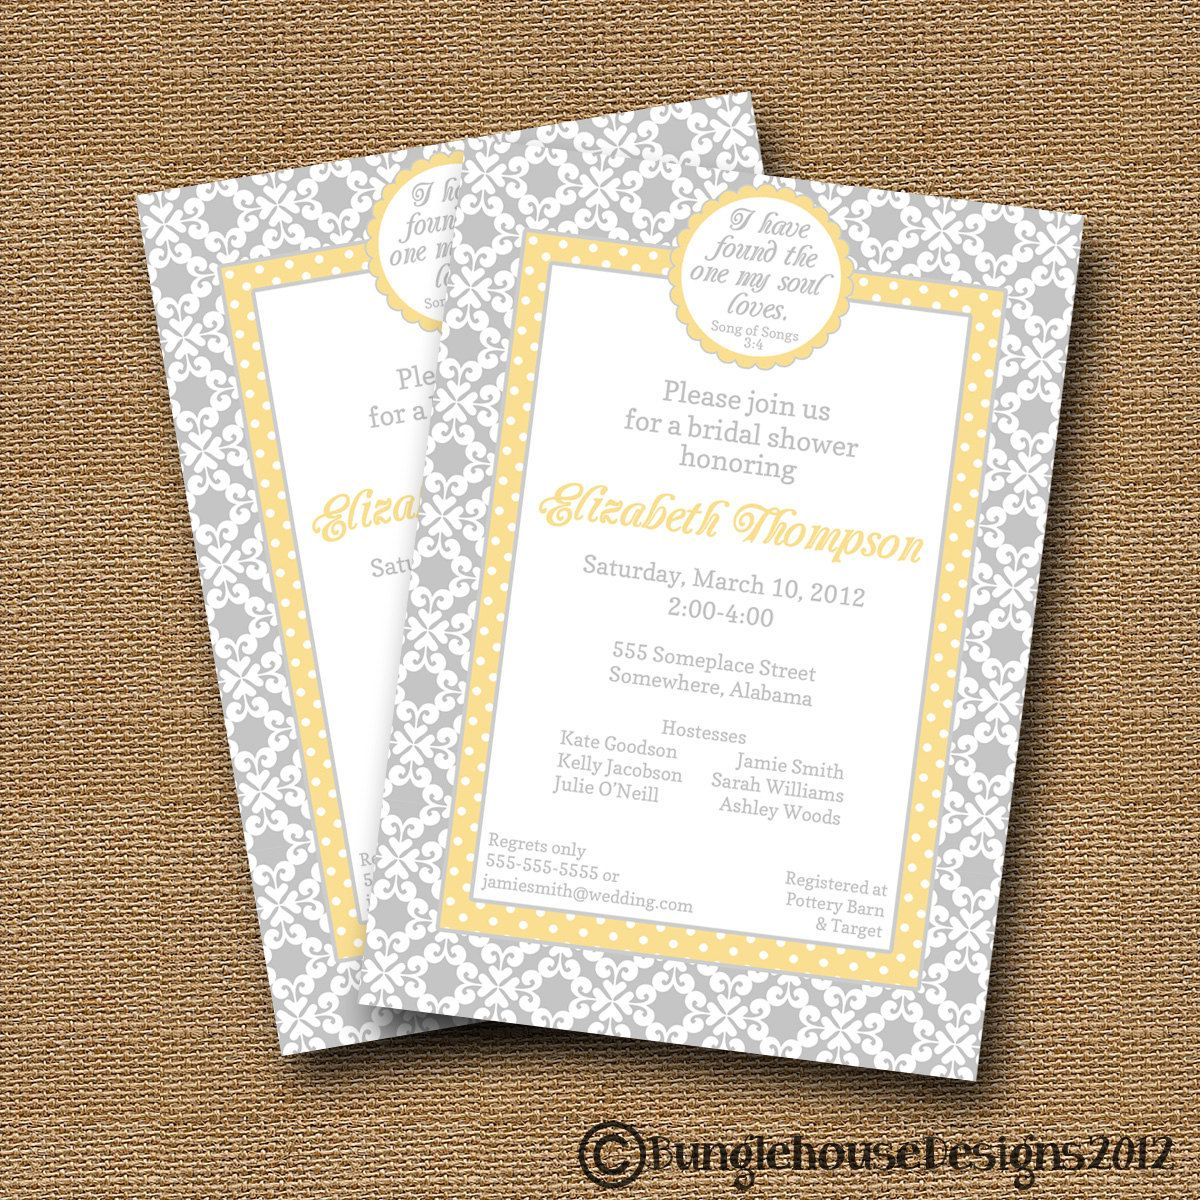 Cute Bridal Shower Wedding Invitation Diy Printable Damask And Dots Christian Wedding Invitations Bridal Shower Invitations Etsy Damask Wedding Invitation